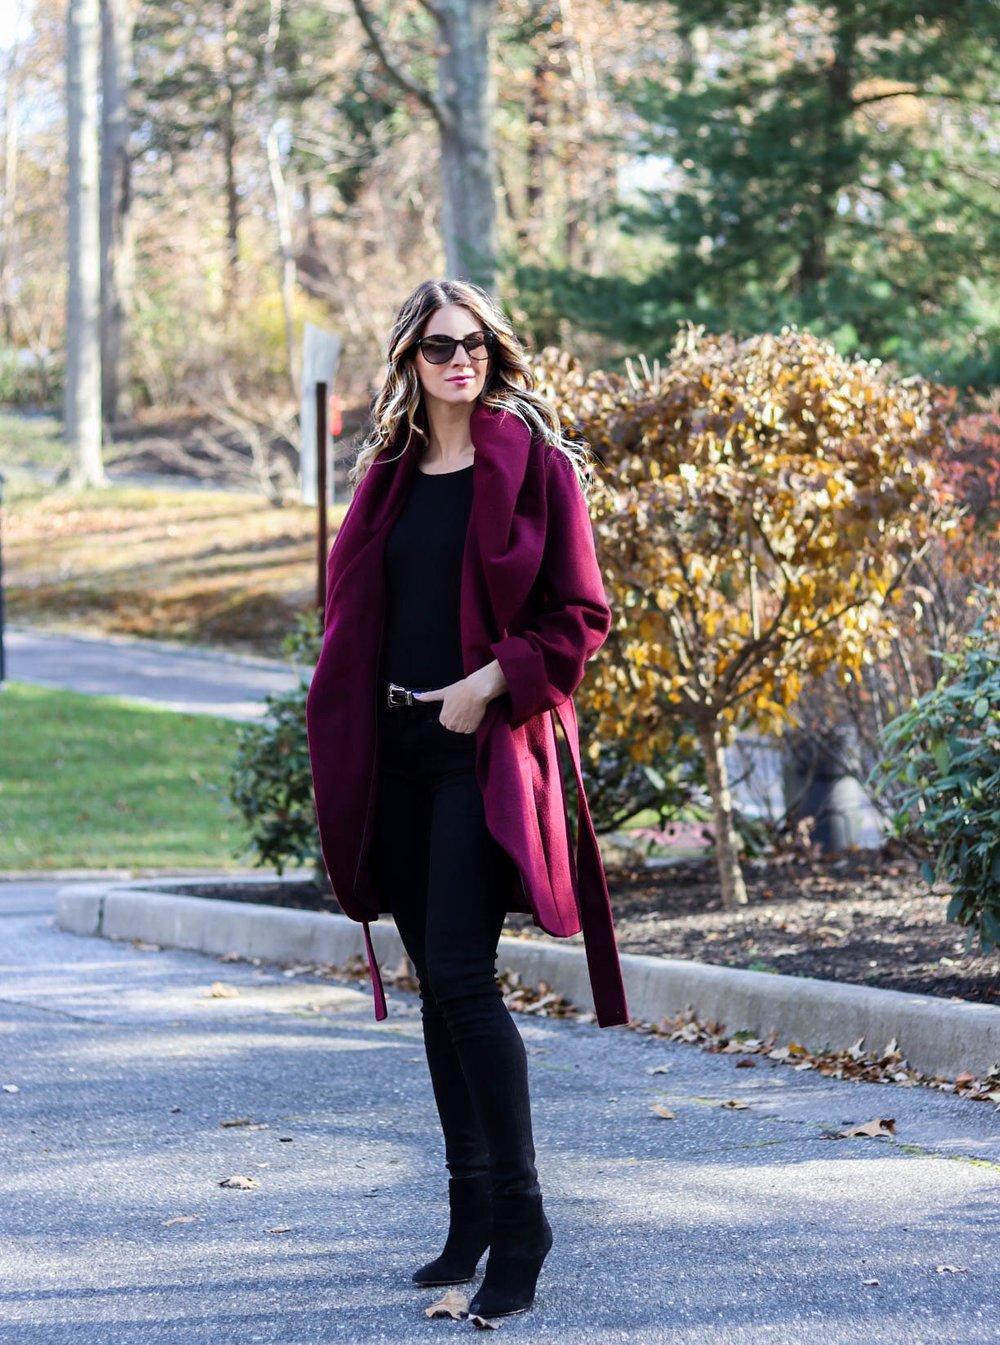 purple coat 1.JPG